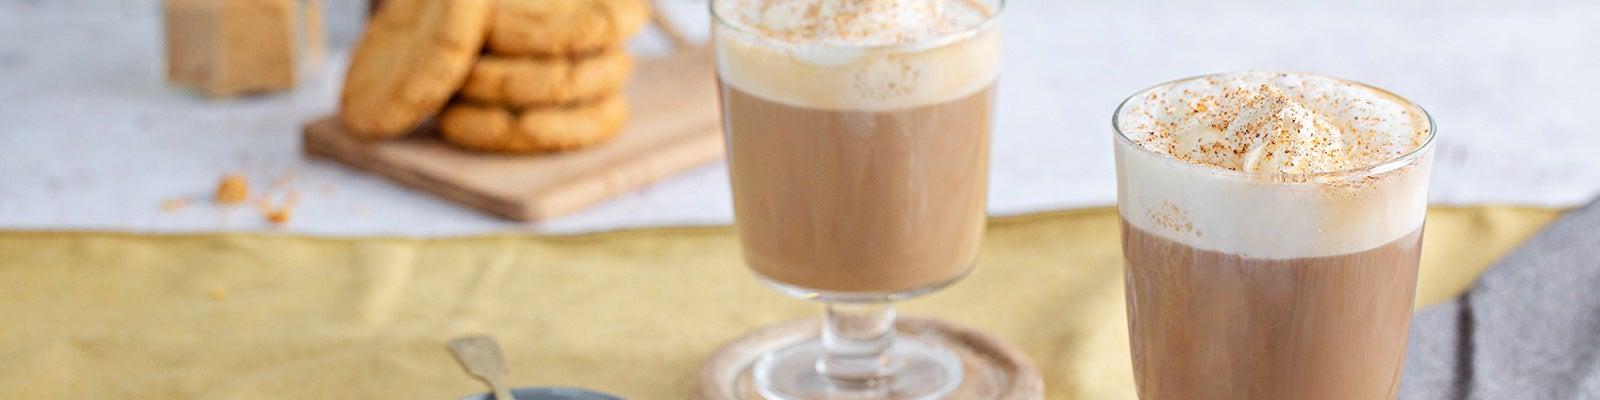 pumpkin-spiced-latte-recipe-header-desktop